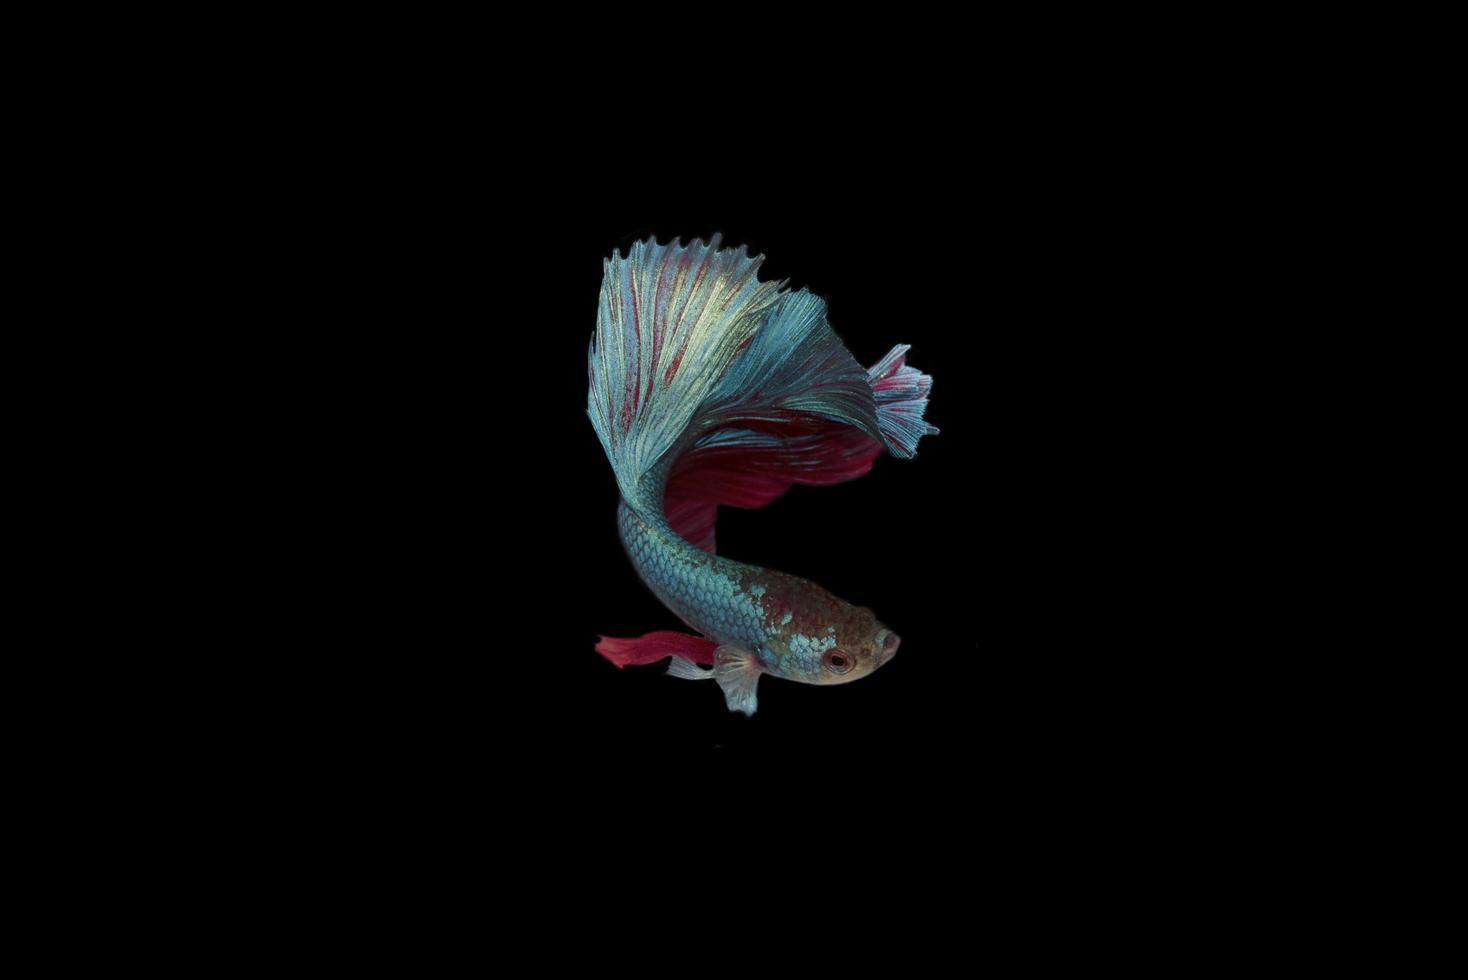 Siamese Halfmoon Betta fighting fish photo